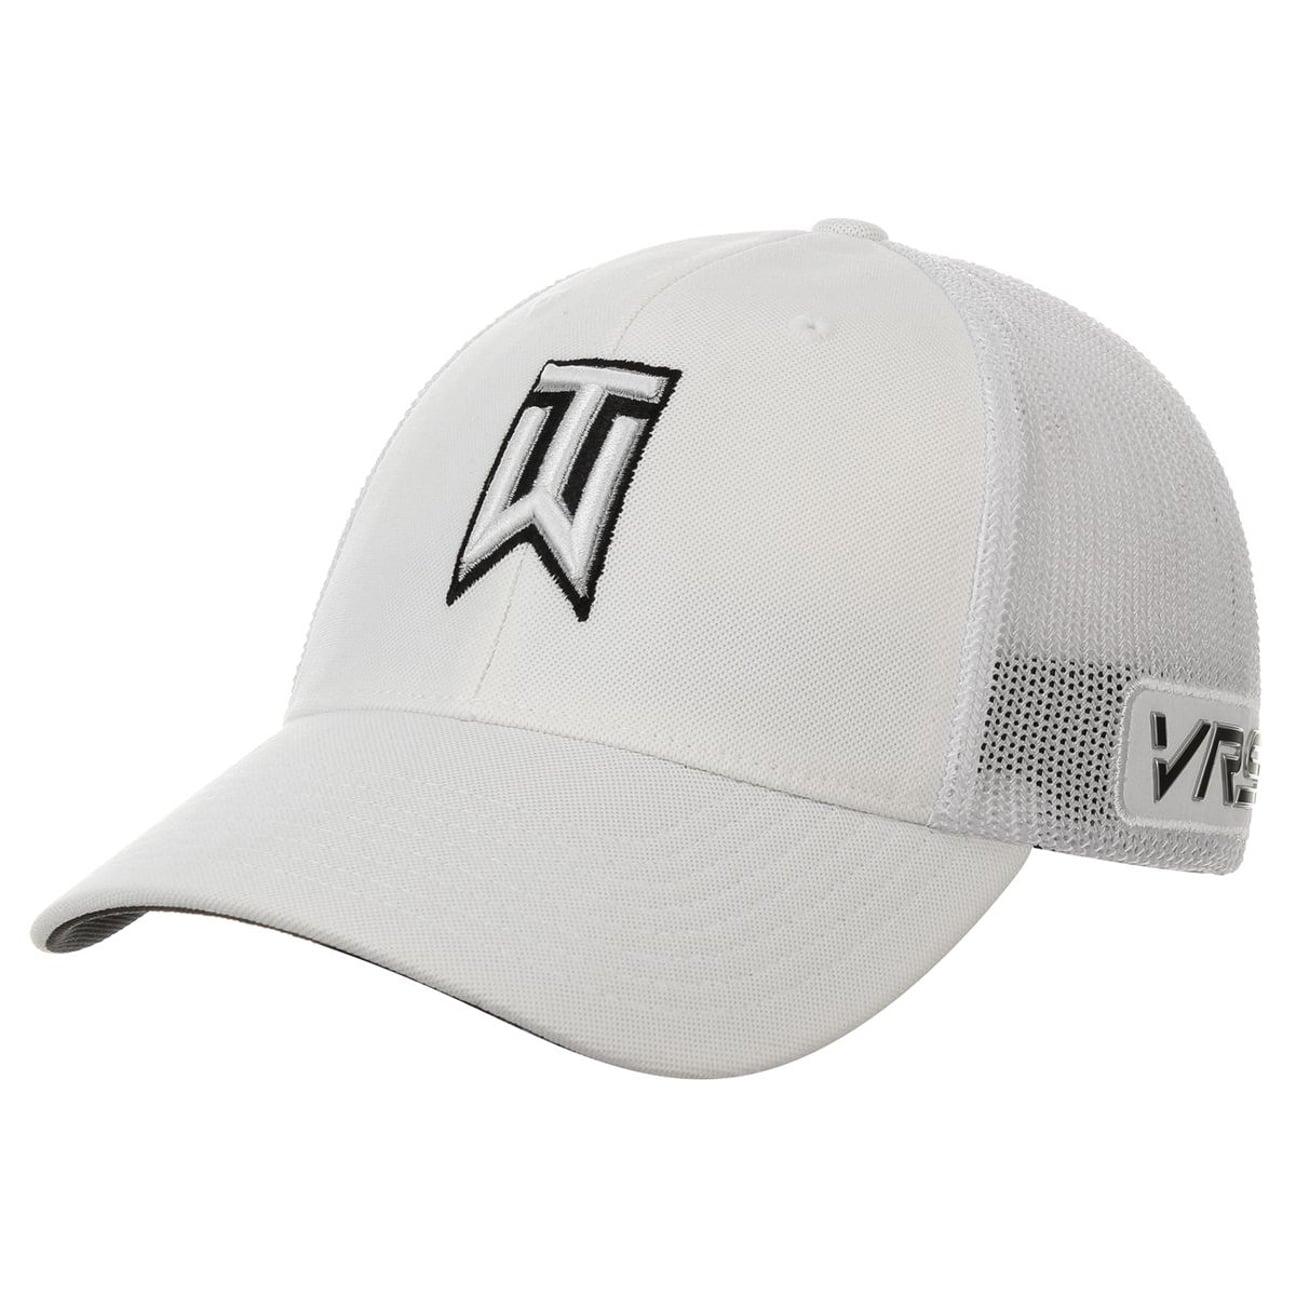 a0372b957 Tiger Woods Flexfit Tour Mesh Cap by Nike